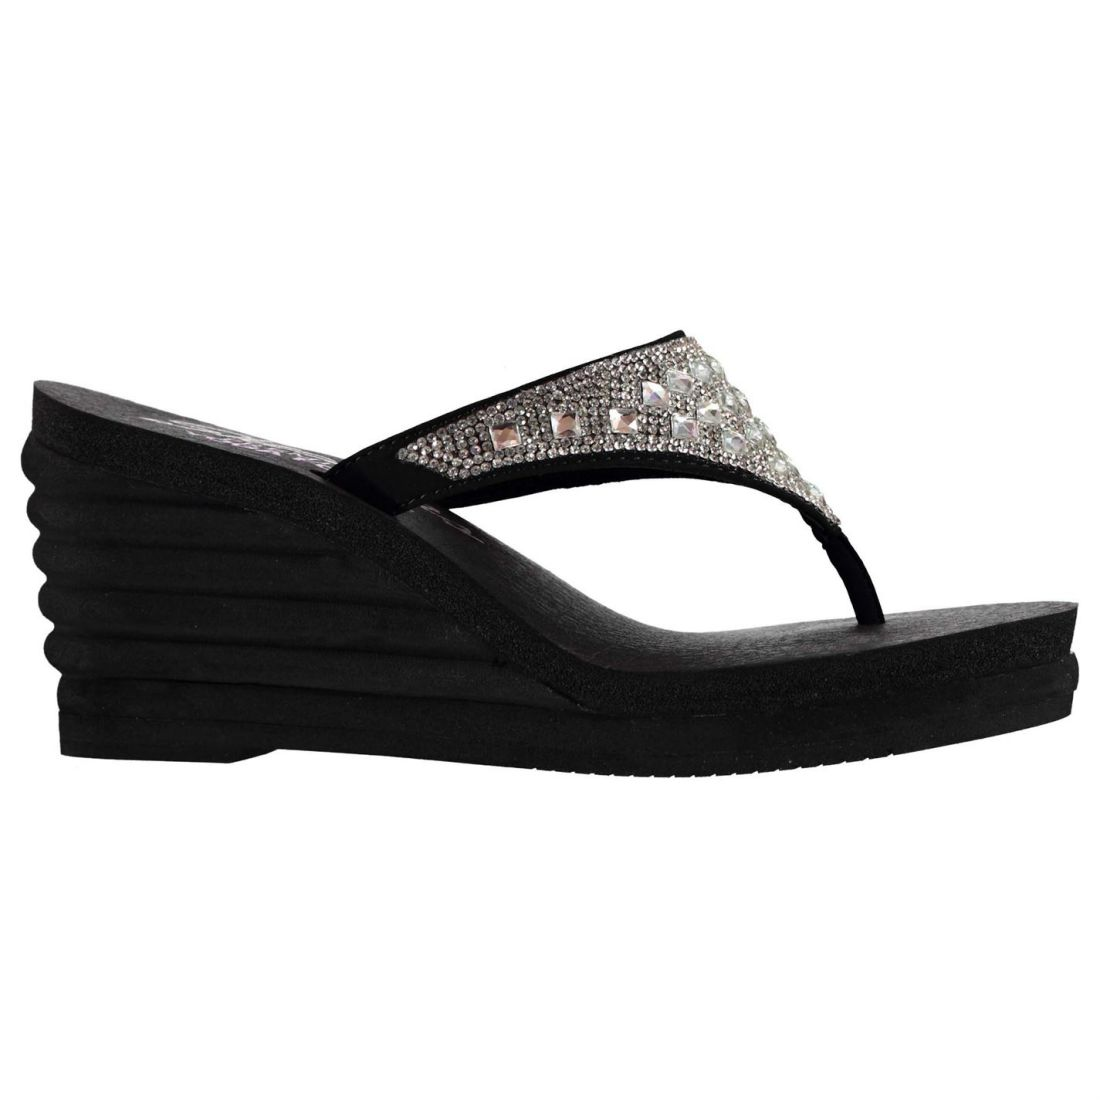 29798ebeb Skechers Womens Bohemian Ar Wedges Platform Sandals Summer Shoes ...